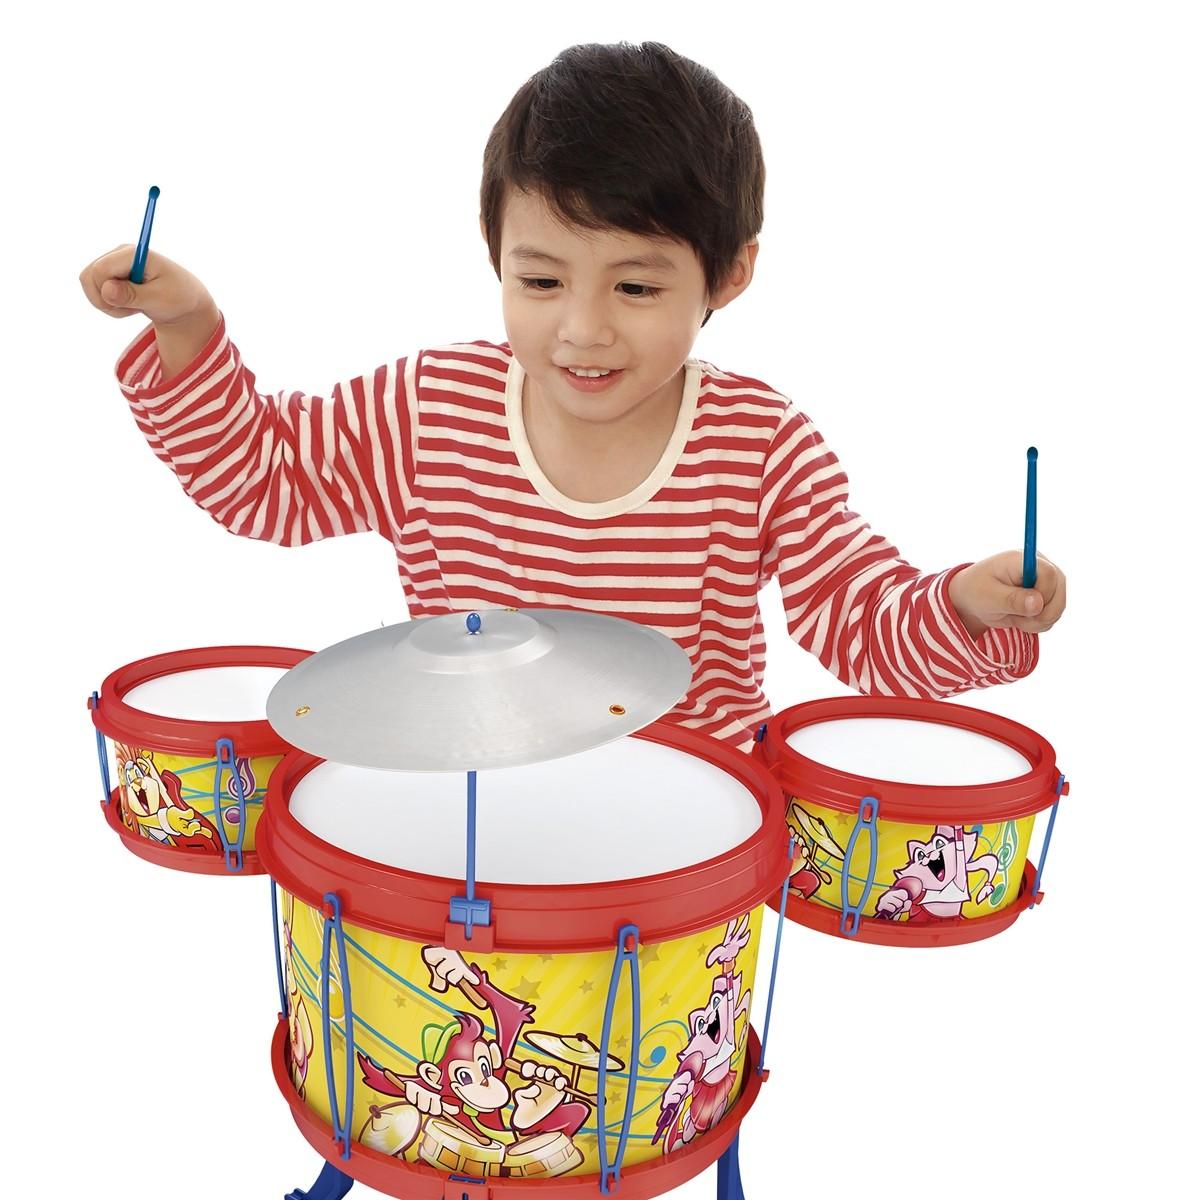 Bateria Musical de Atividades - Rosita